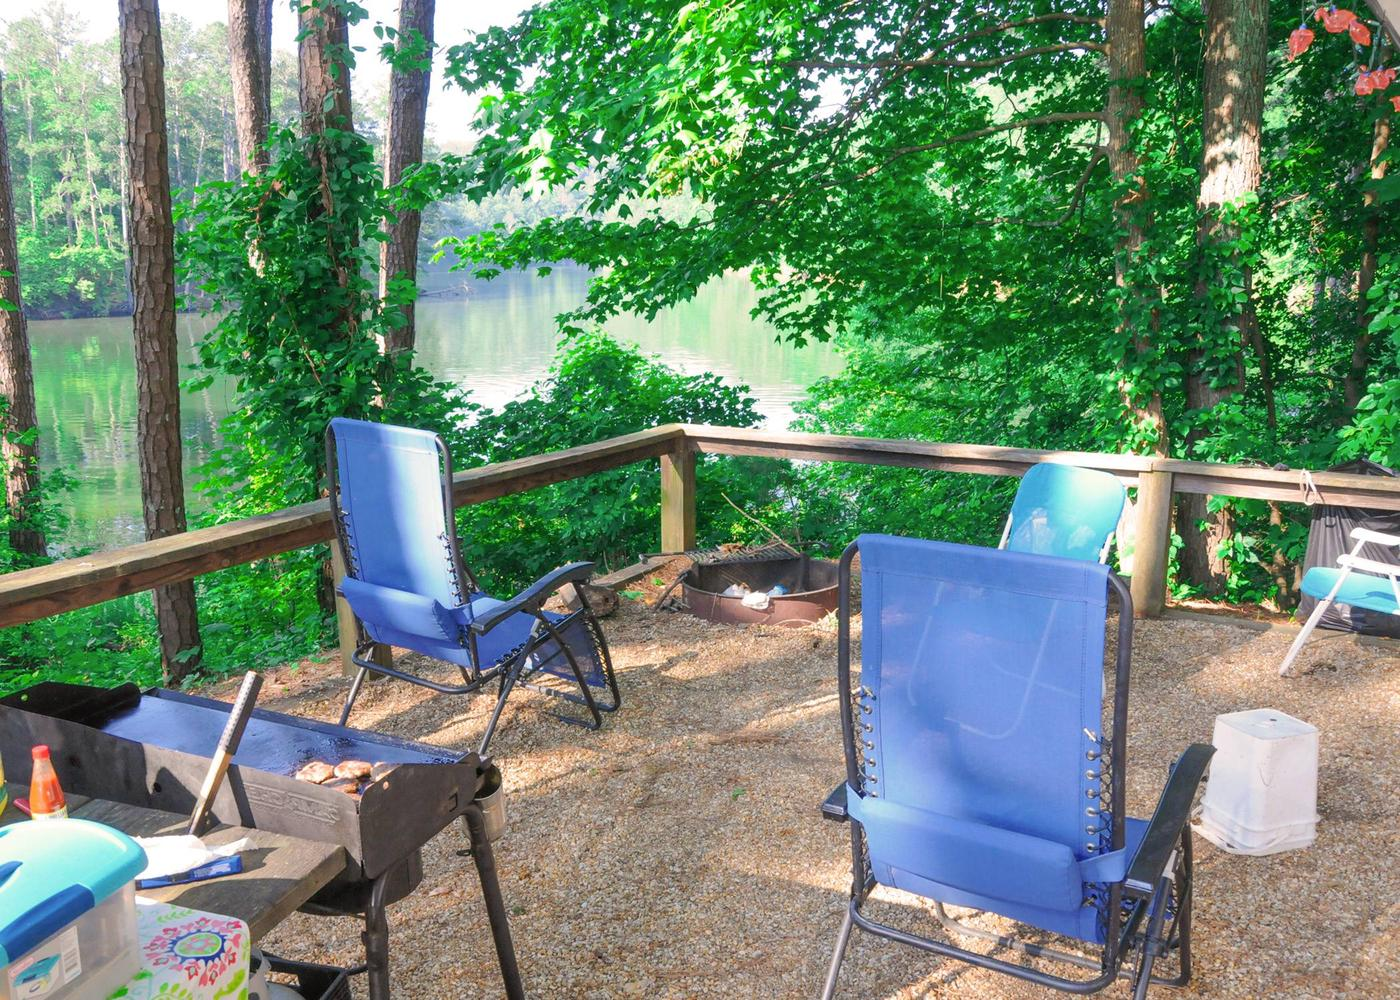 Campsite view.Upper Stamp Creek Campground, campsite 11